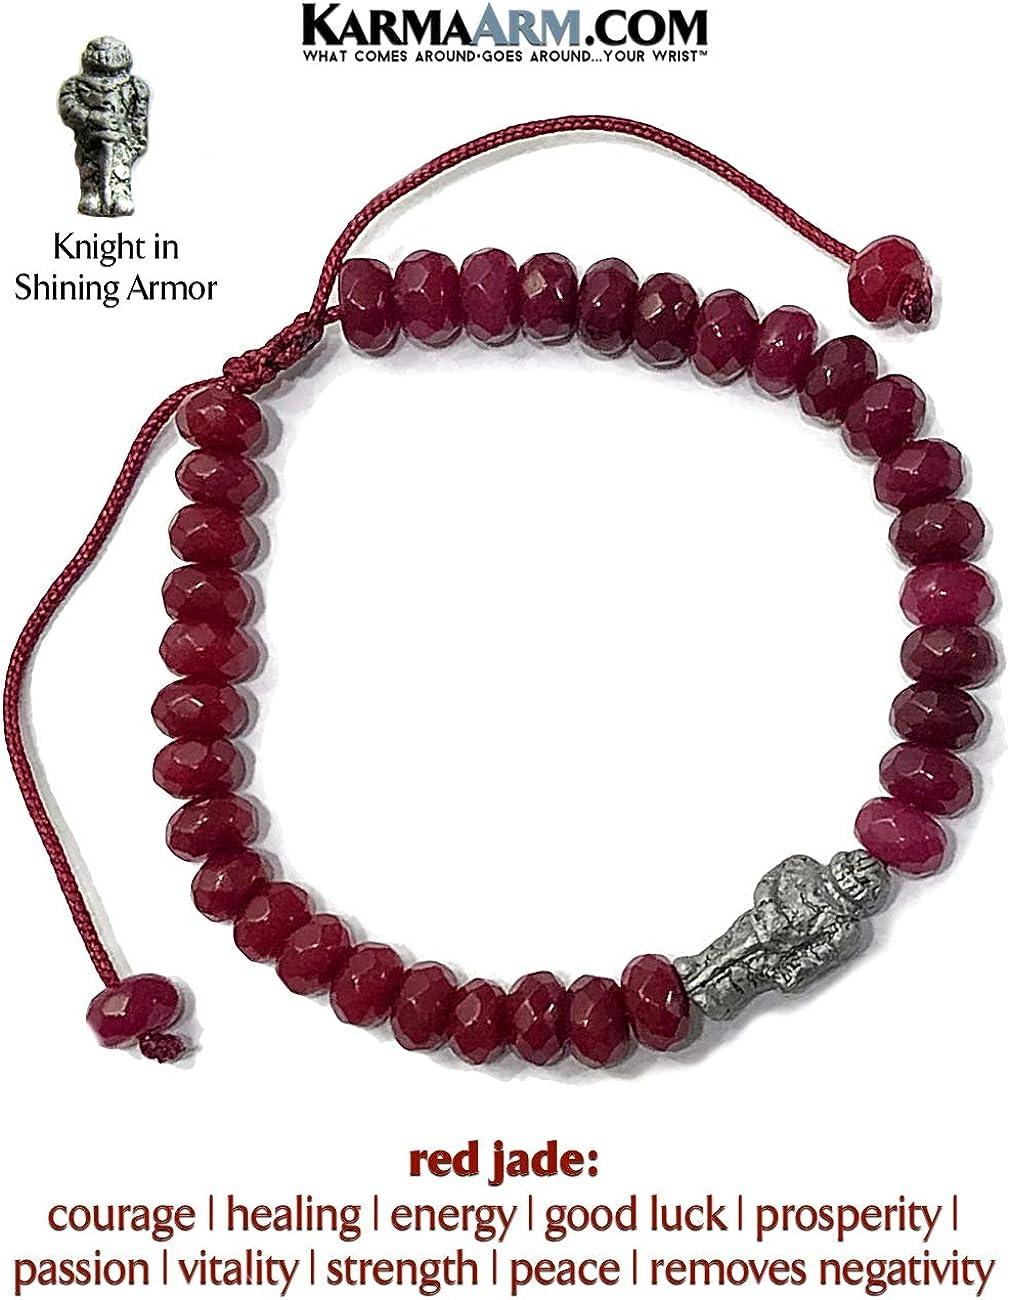 Change Natural Black Onyx Red Coral Beaded Meditation Spiritual Stretch Mantra Reiki Healing Energy Boho Chakra Wrap Yoga Tibetan Buddhist Jewelry /& Gifts KarmaArm Silver Gothic Cross Bracelet